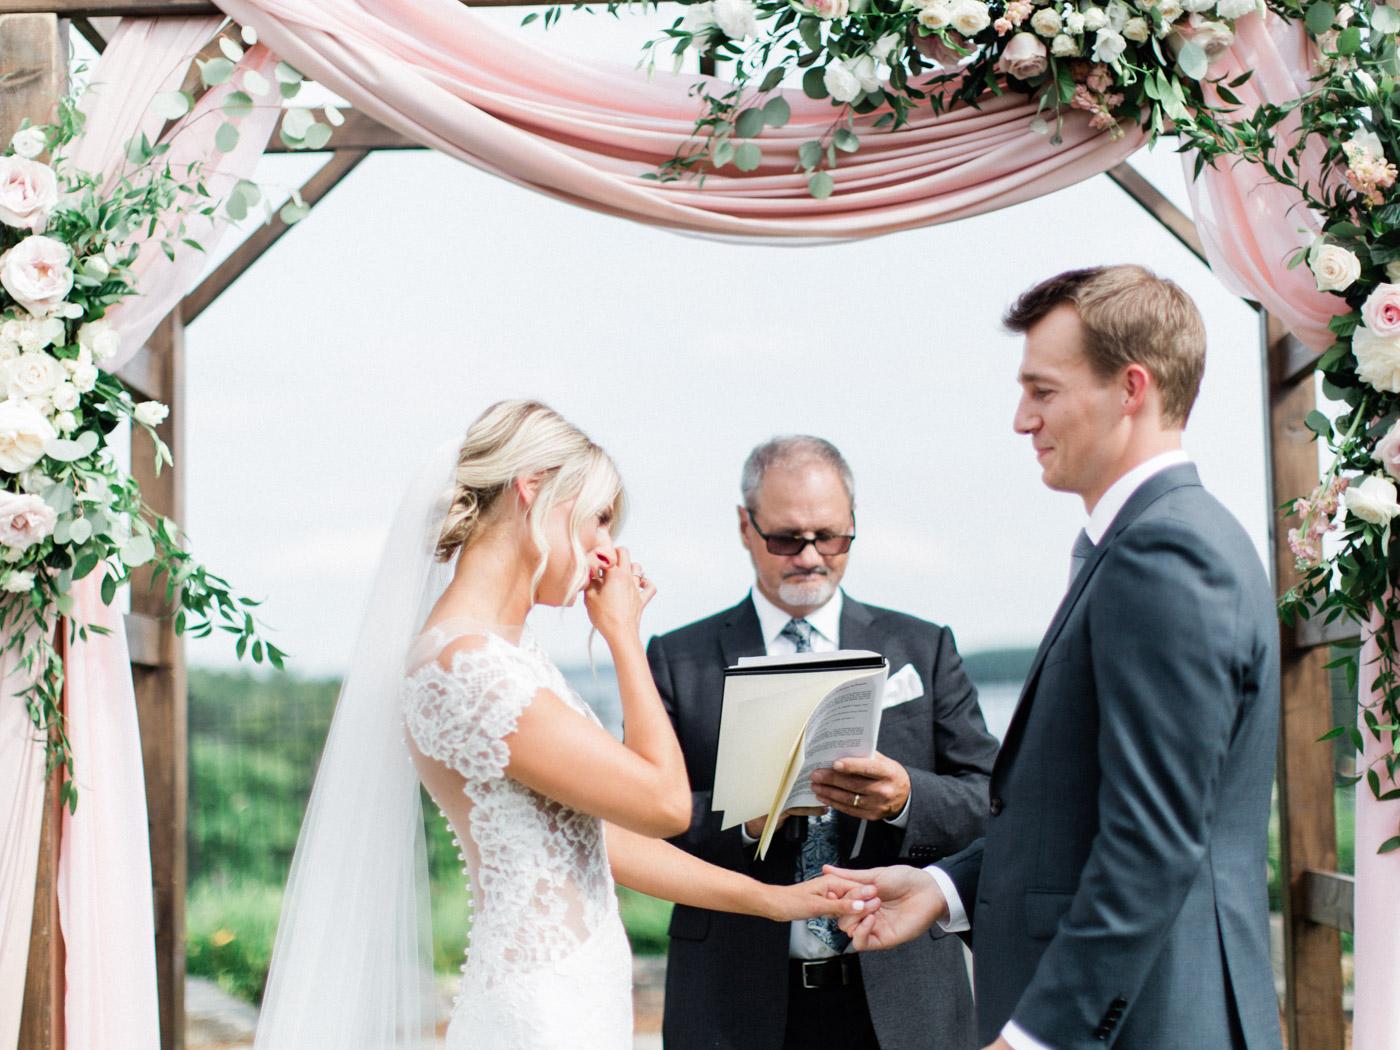 Toronto-Muskoka-wedding-photographer-summery-fun-documentary-the-marriott-rosseau84.jpg